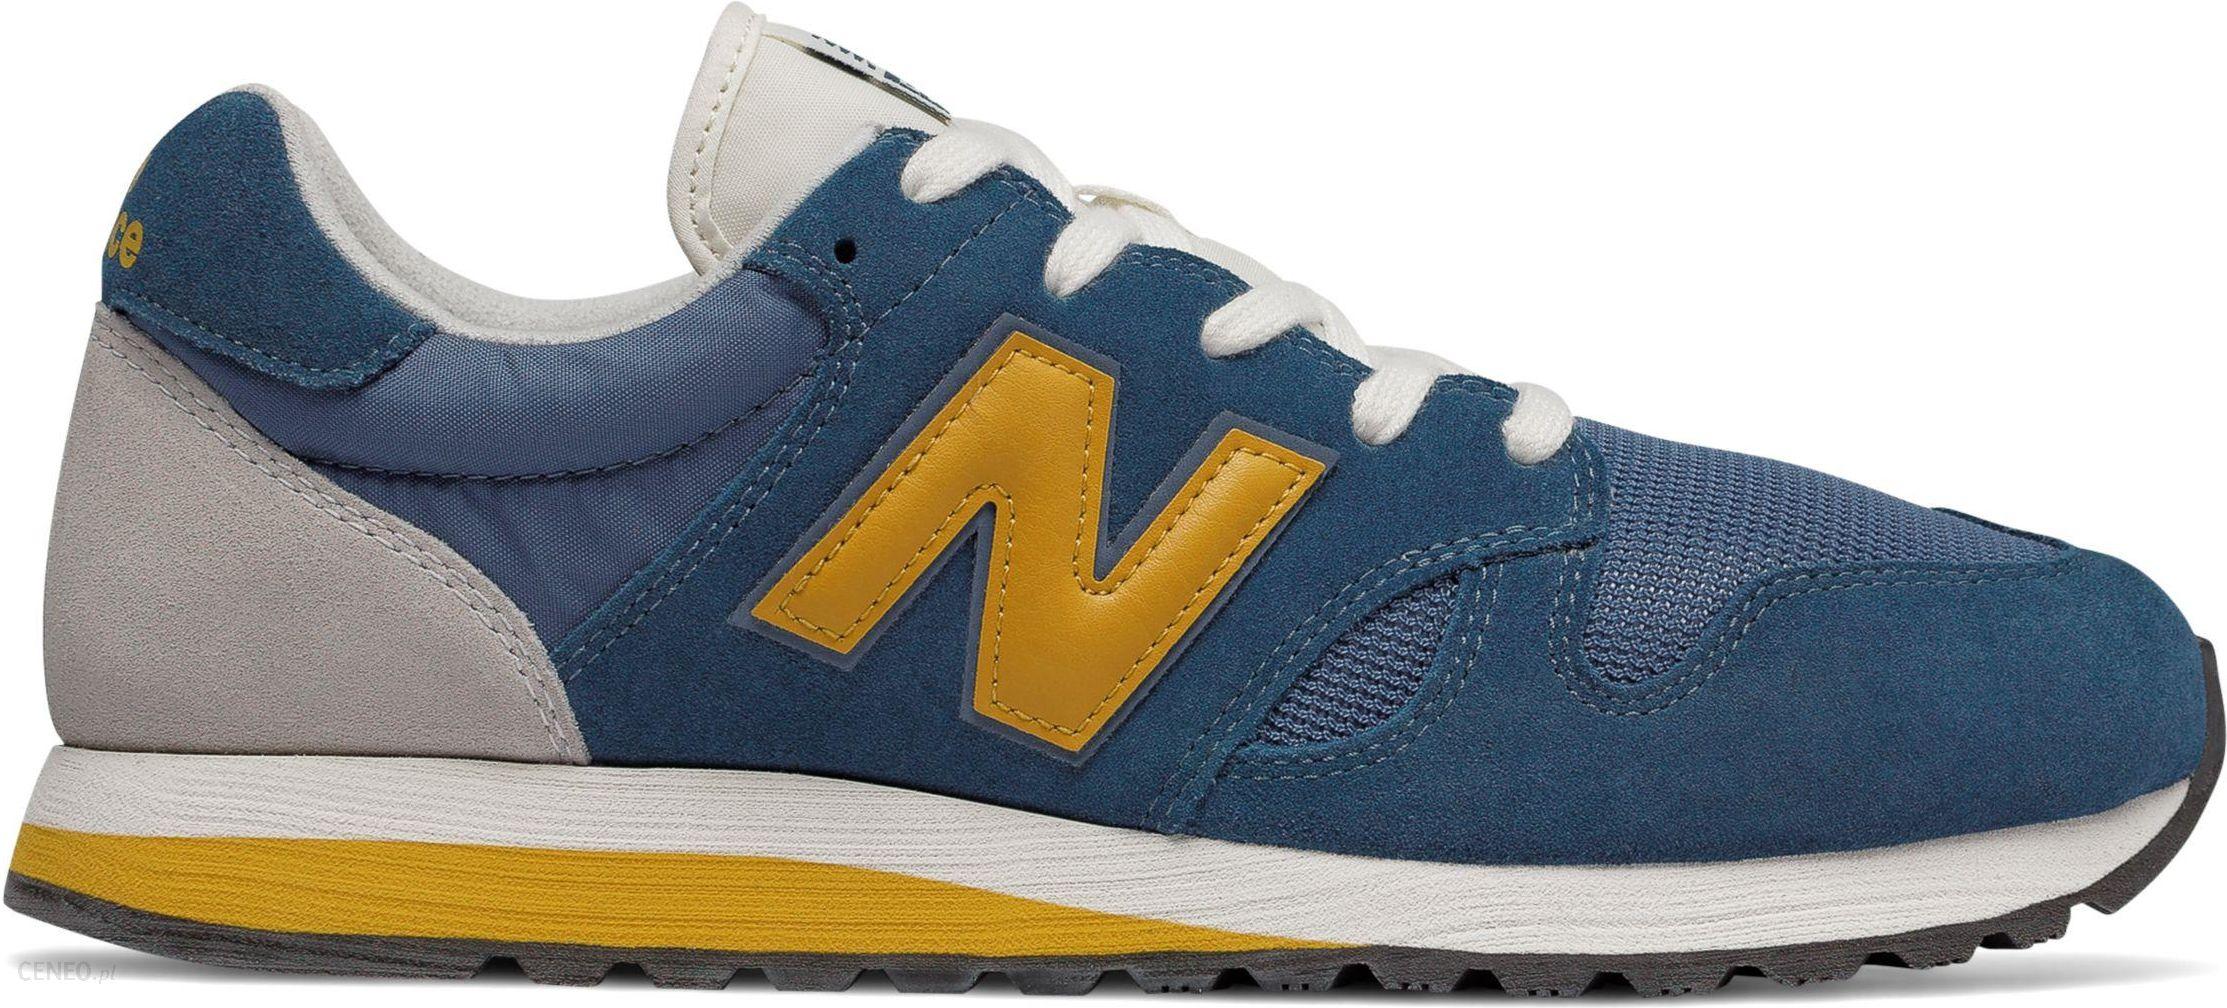 New Balance 520 70s Running Dark Blue